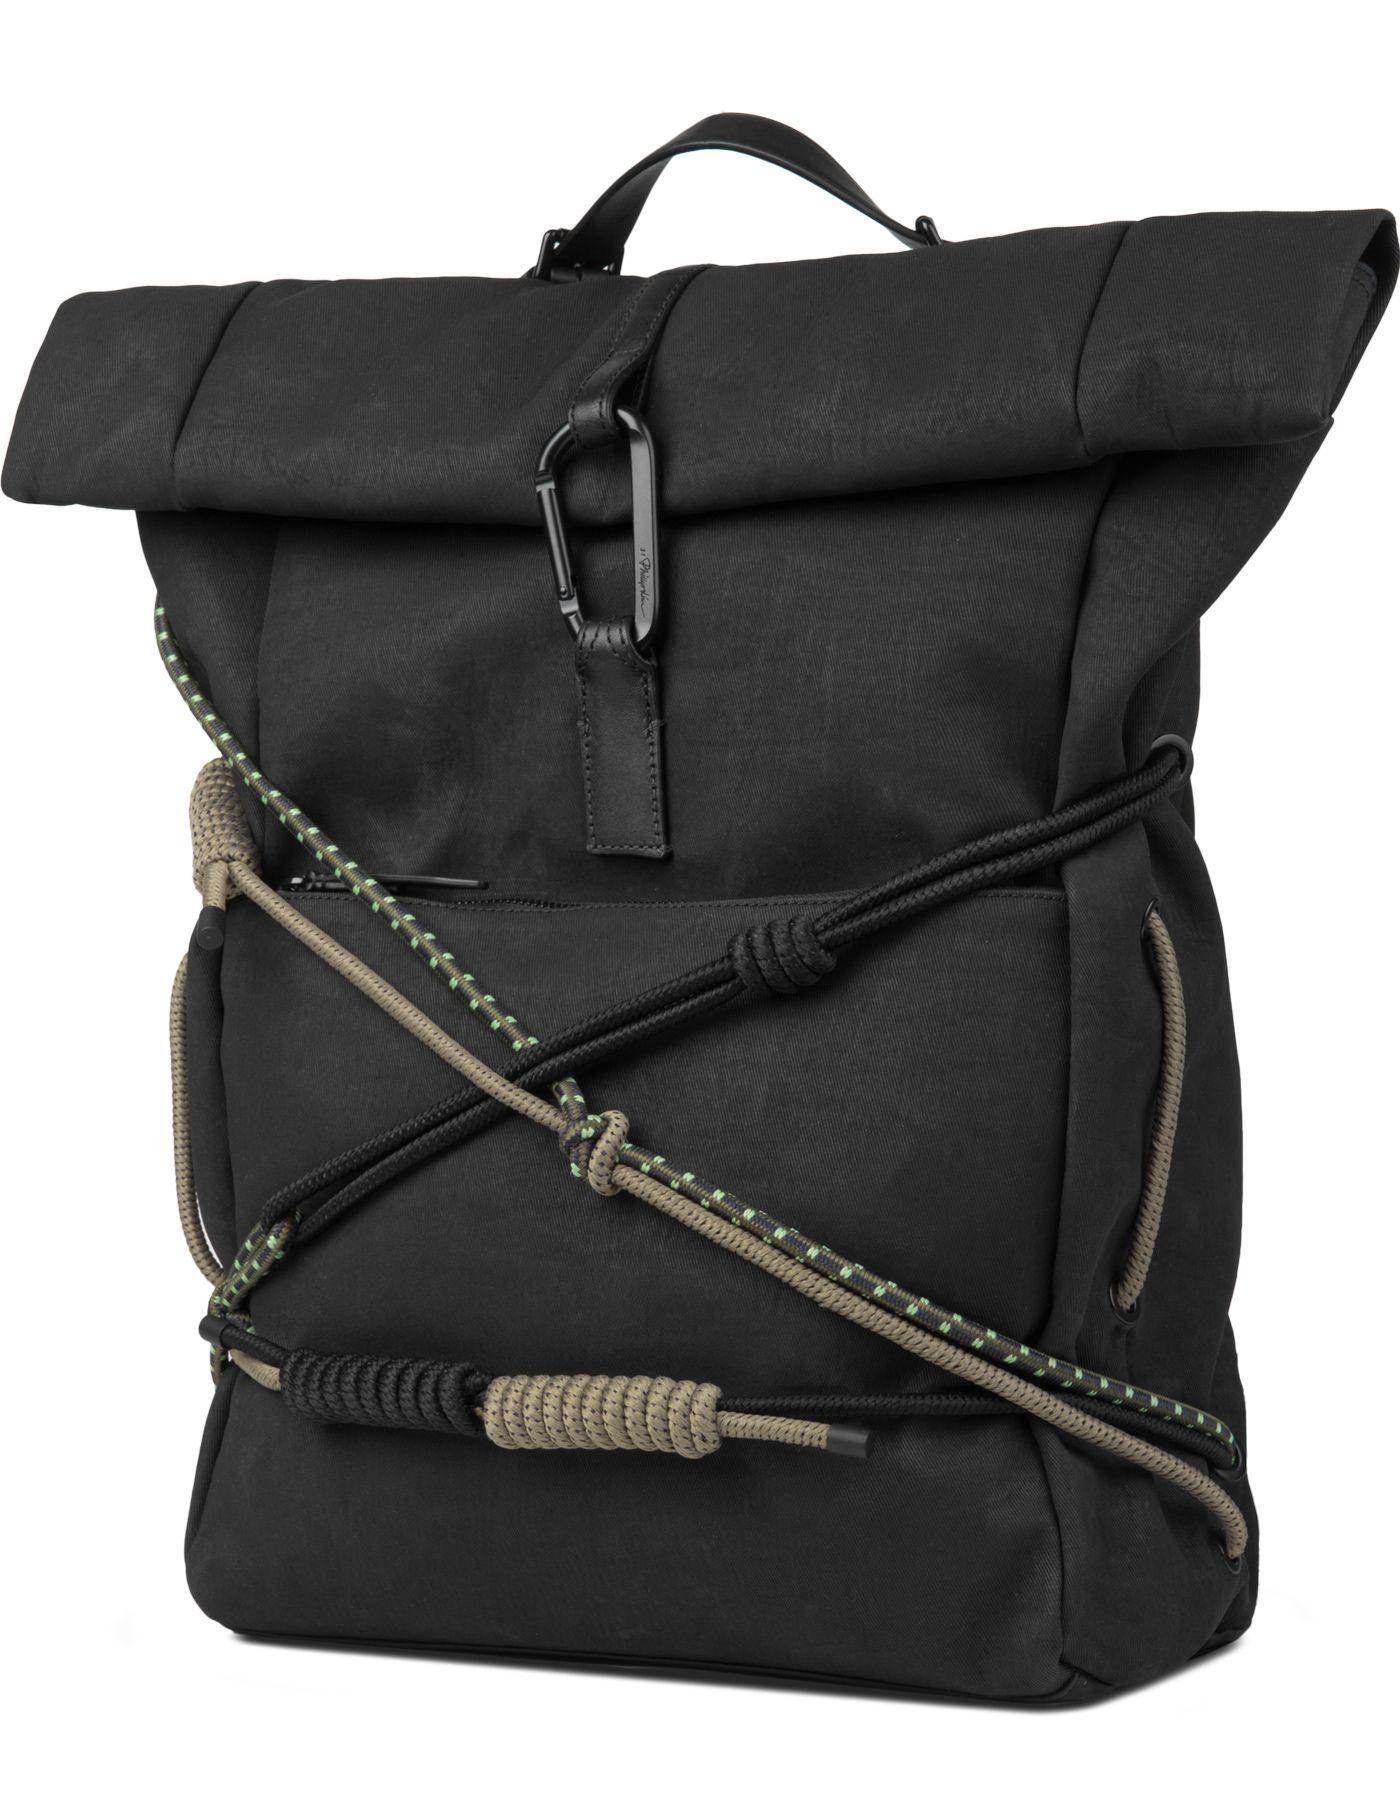 Black Alpine Roll Top Backpack | style Top backpacks